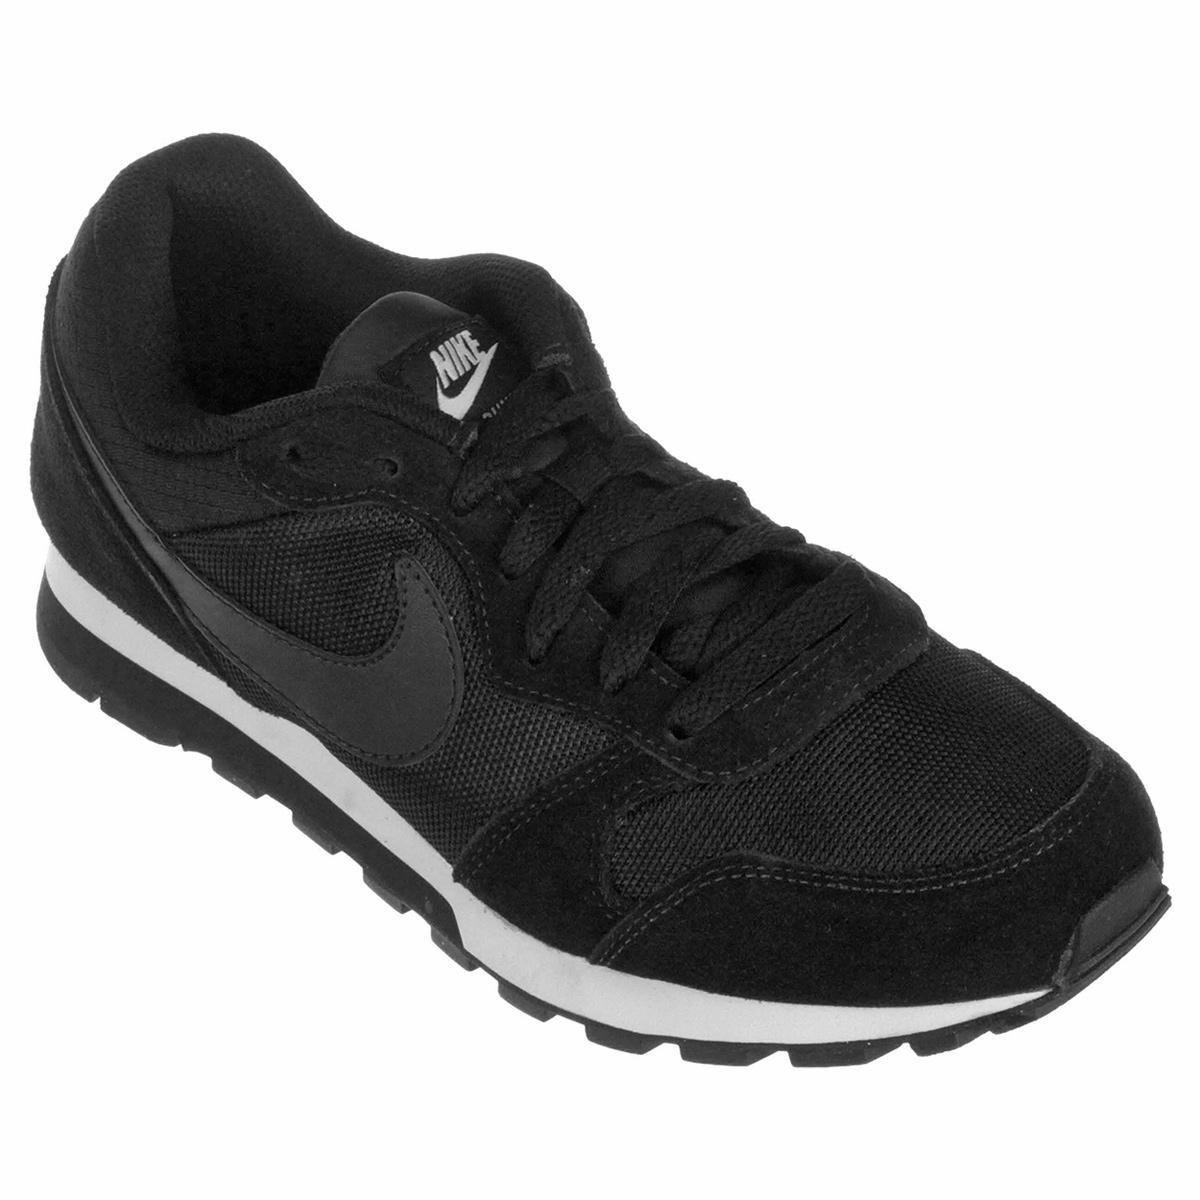 8794f5ae1a Tênis Nike Md Runner 2 Feminino